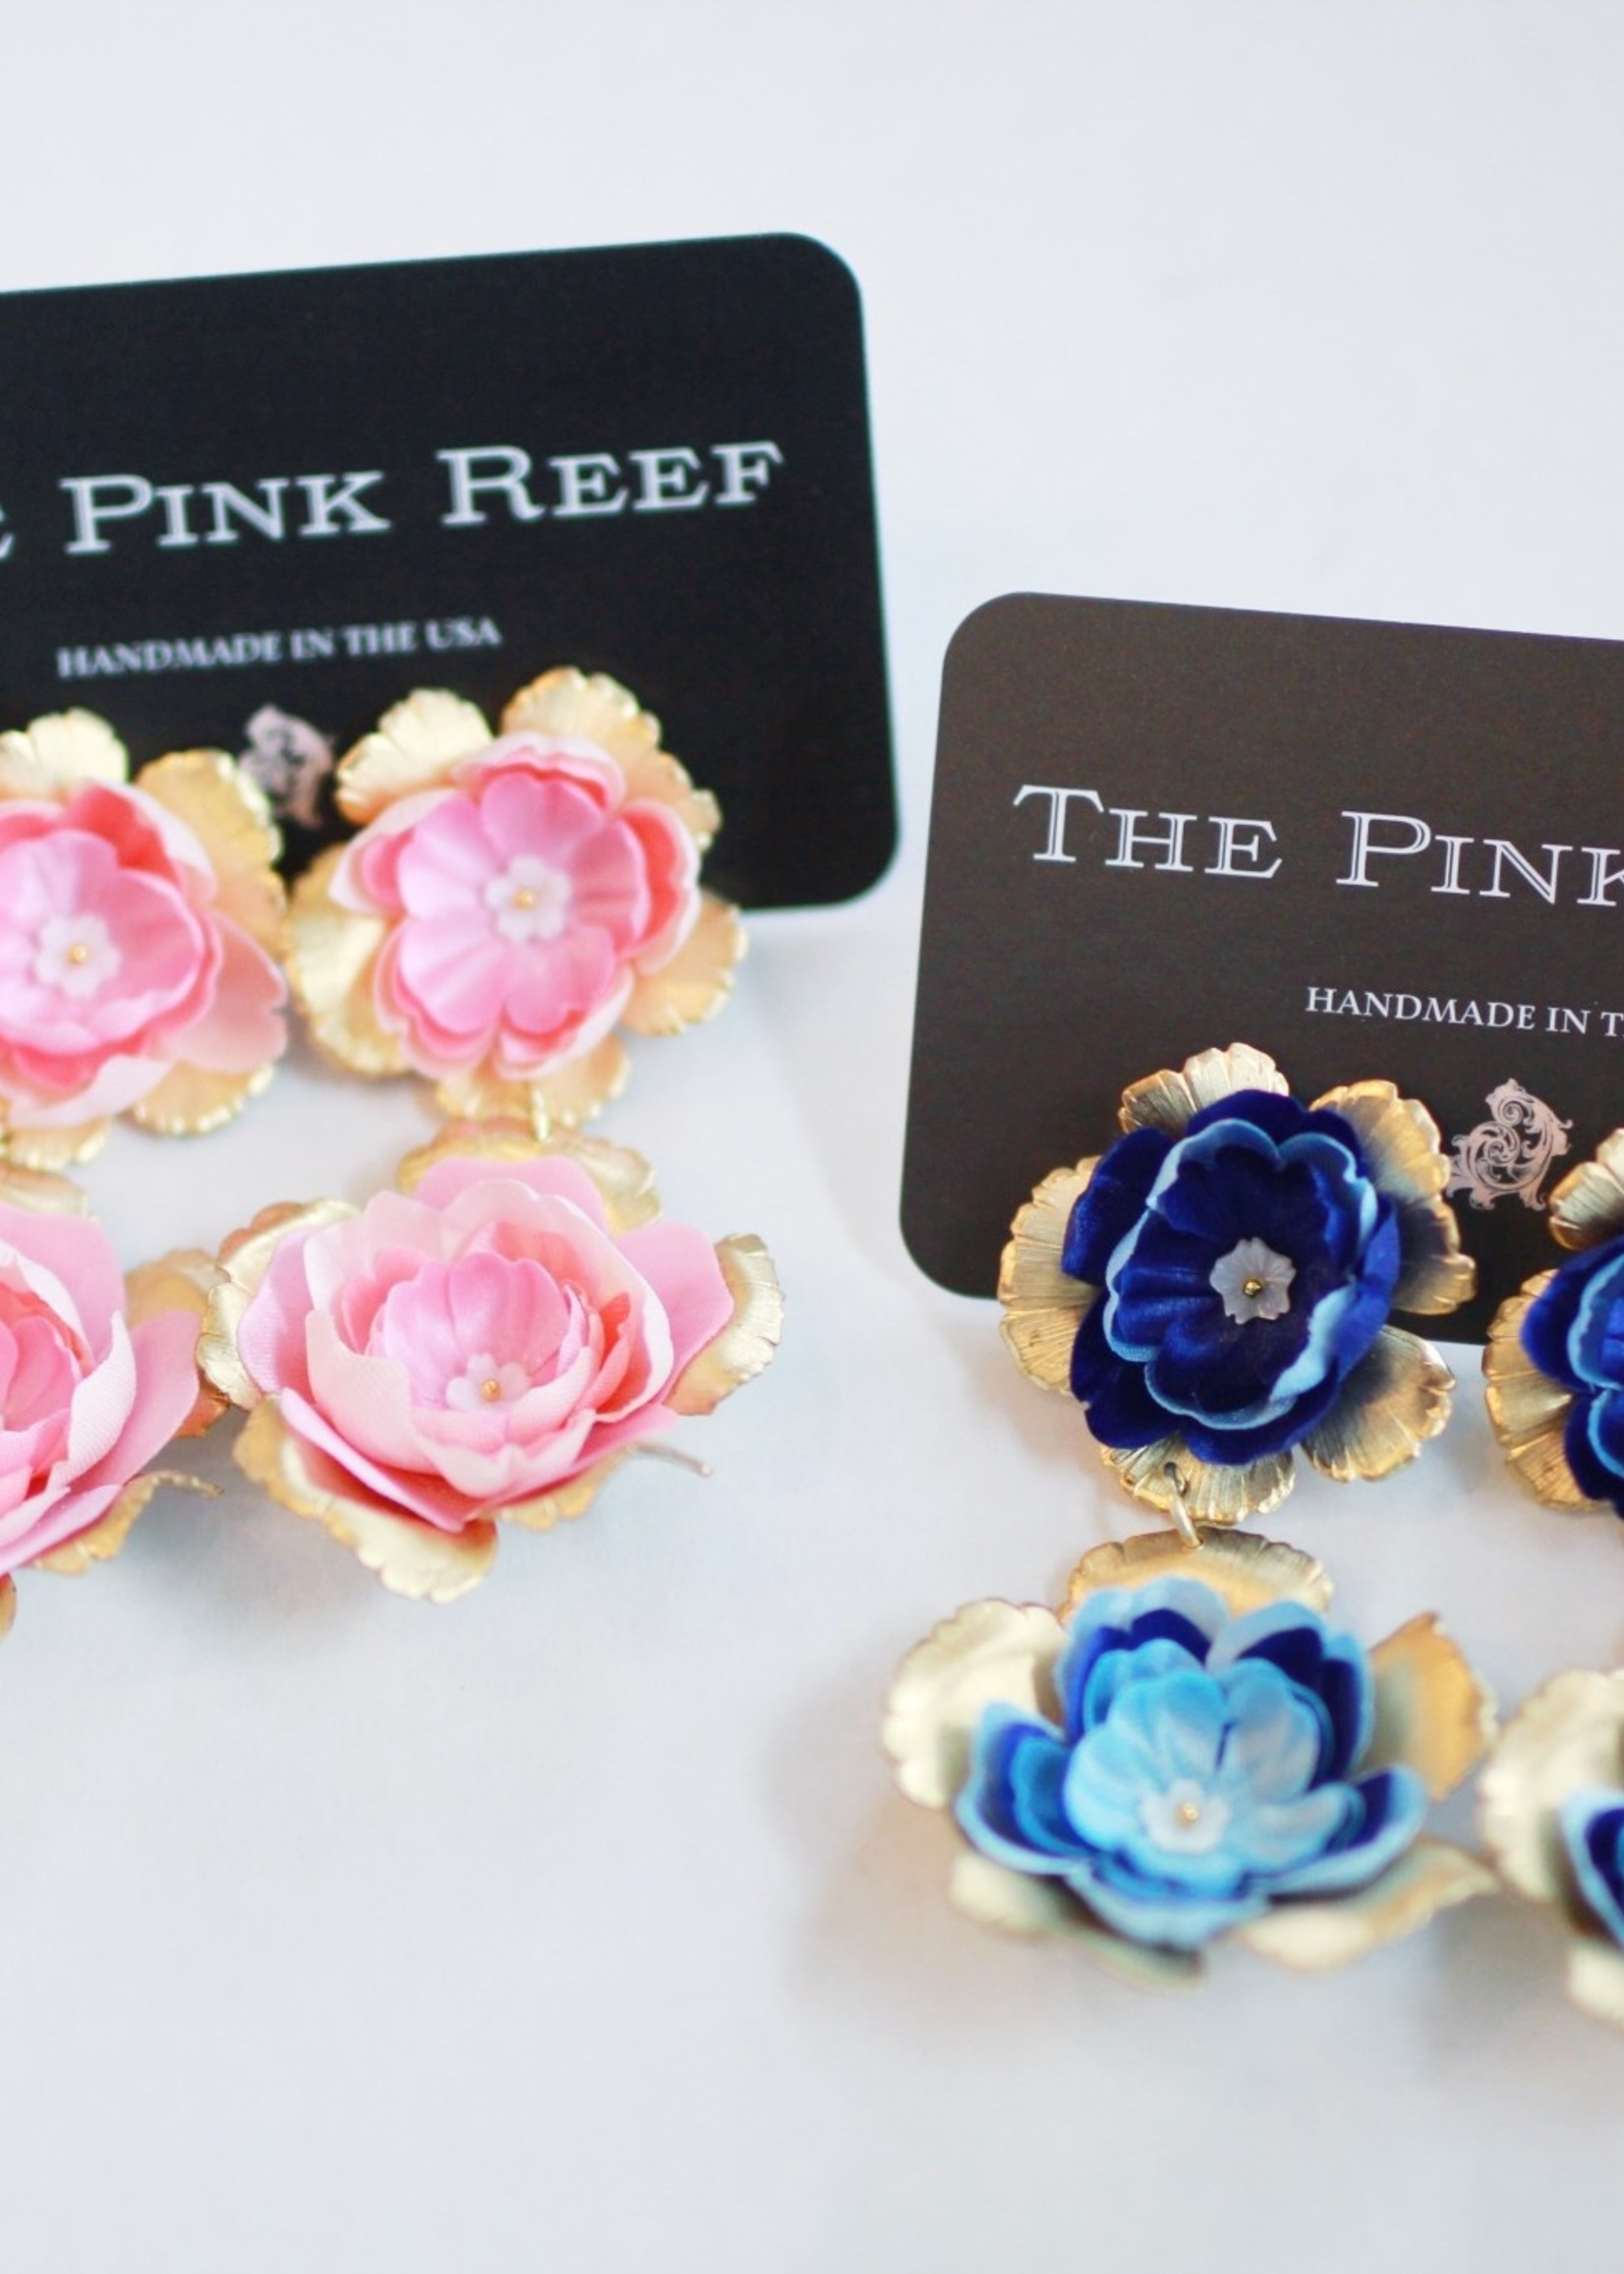 Pink Reef Pink Reef Hand Cut Floral Drops